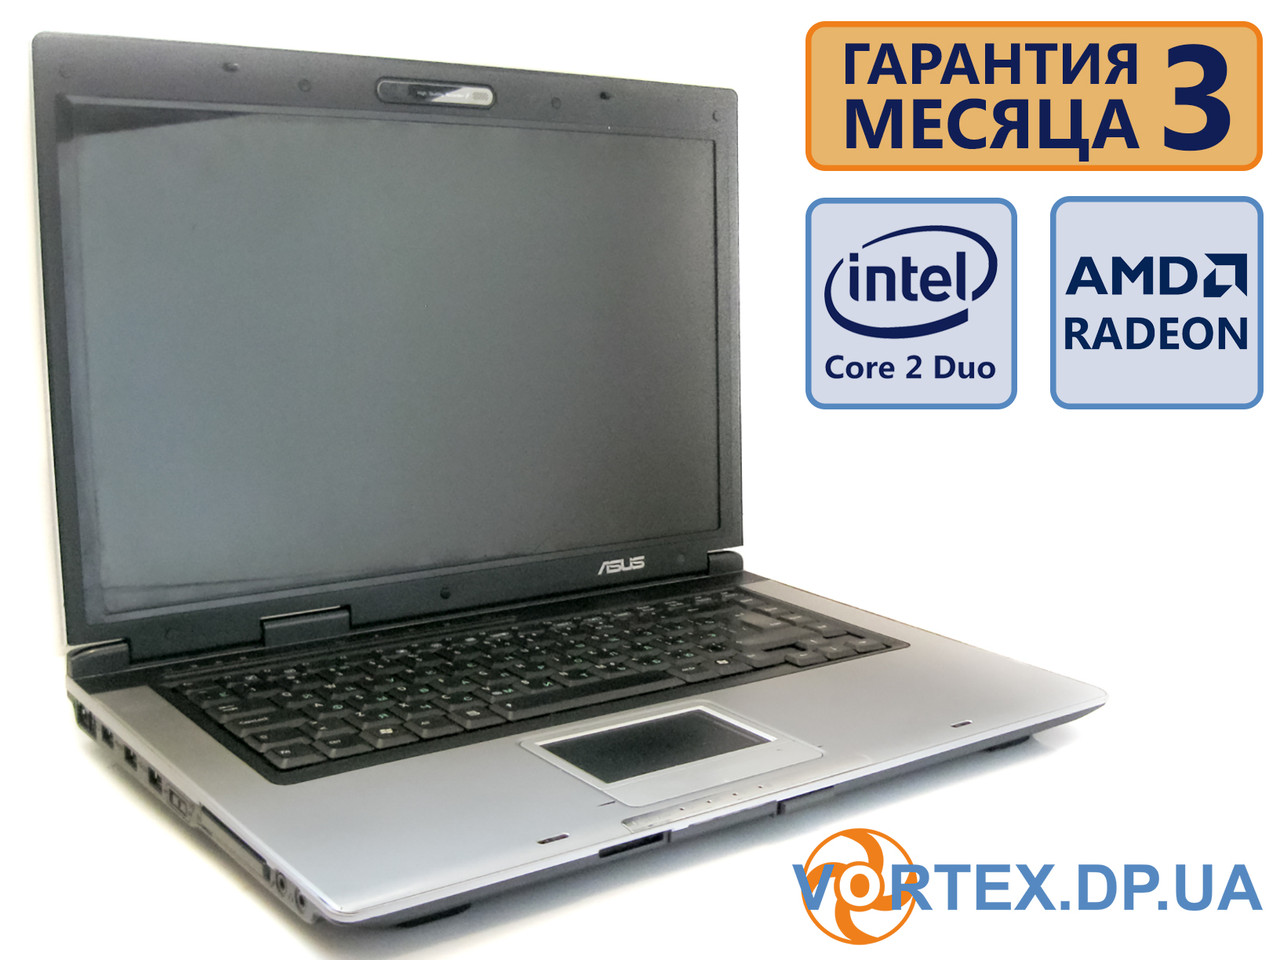 Ноутбук Asus X50VL 15.4 (1280x800) / Intel Core 2 Duo T5750 (2x2.0GHz)